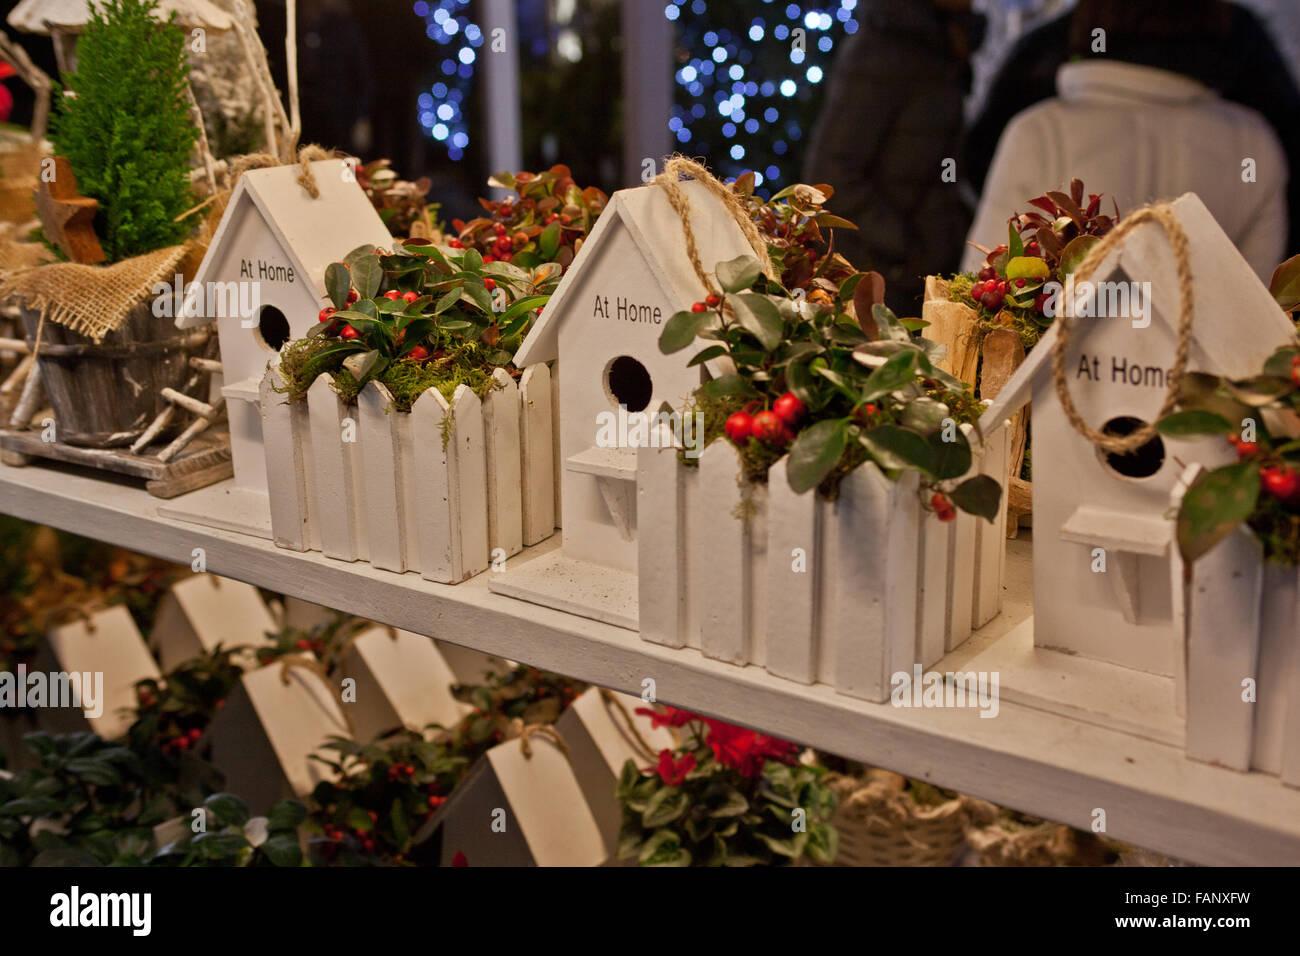 Christmas markets at Verona 25 december 2015 - Stock Image